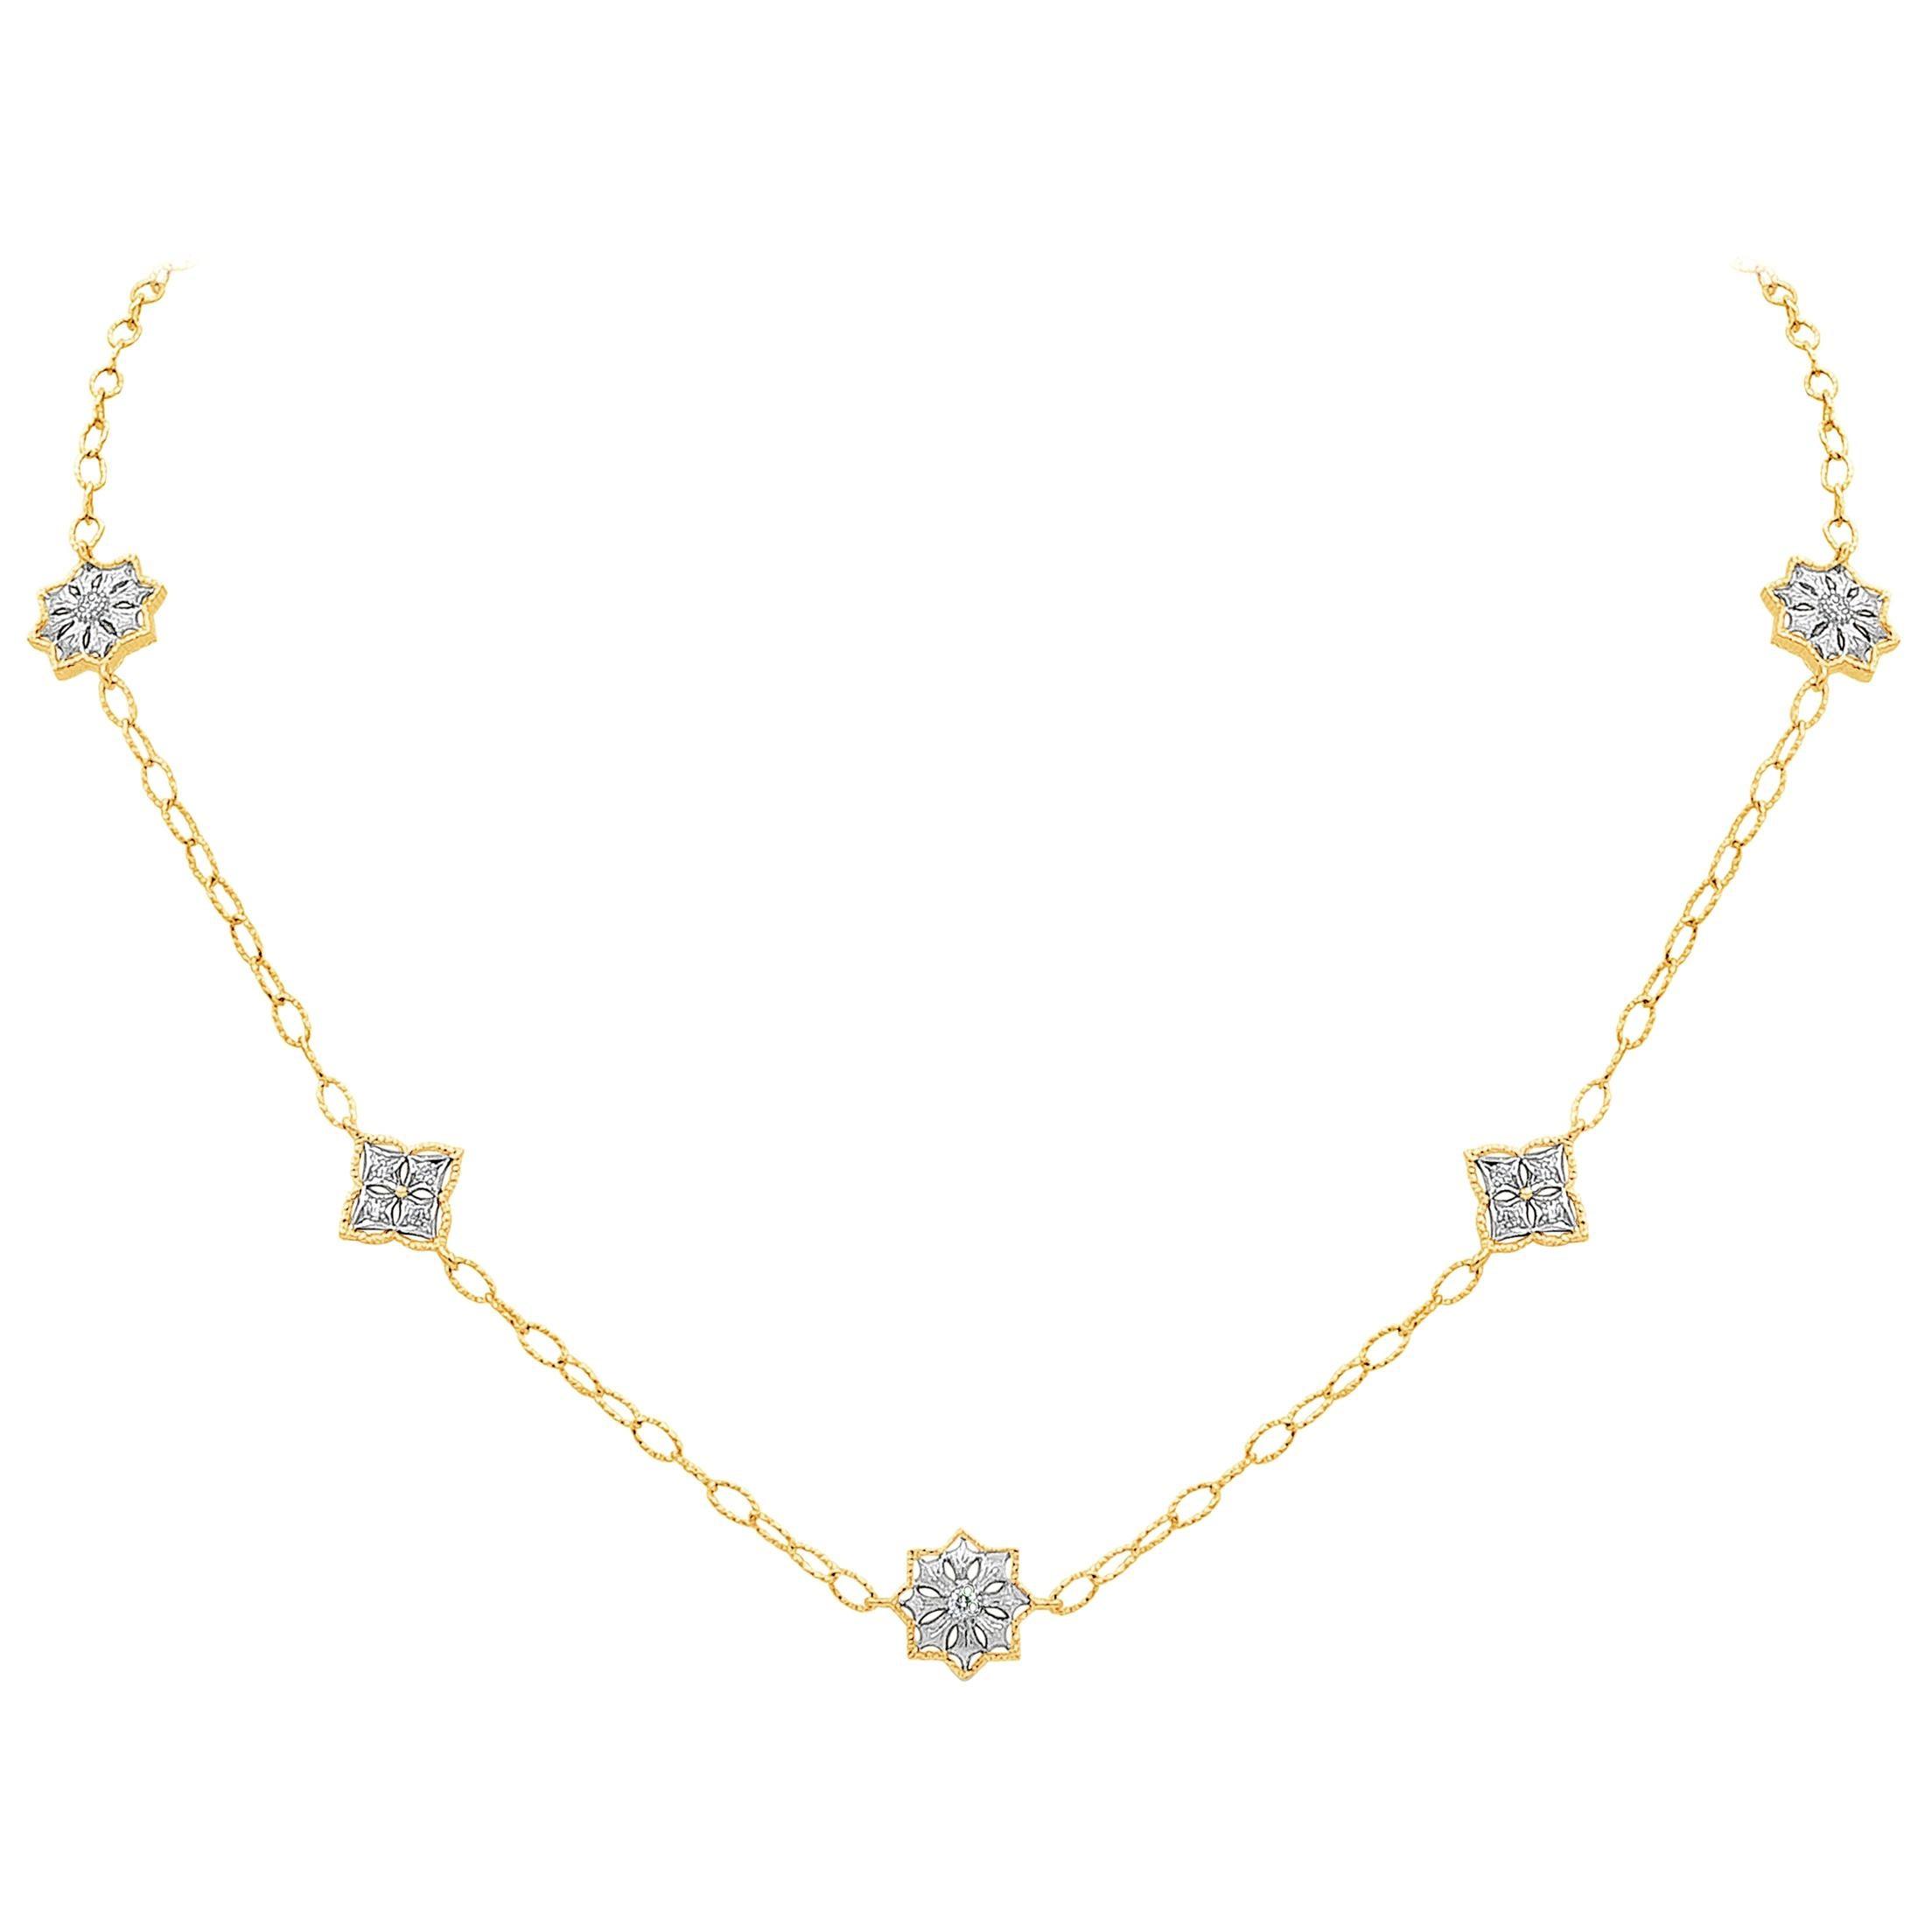 Roman Malakov Open-Work Diamond Ribbed Chain Fashion Necklace